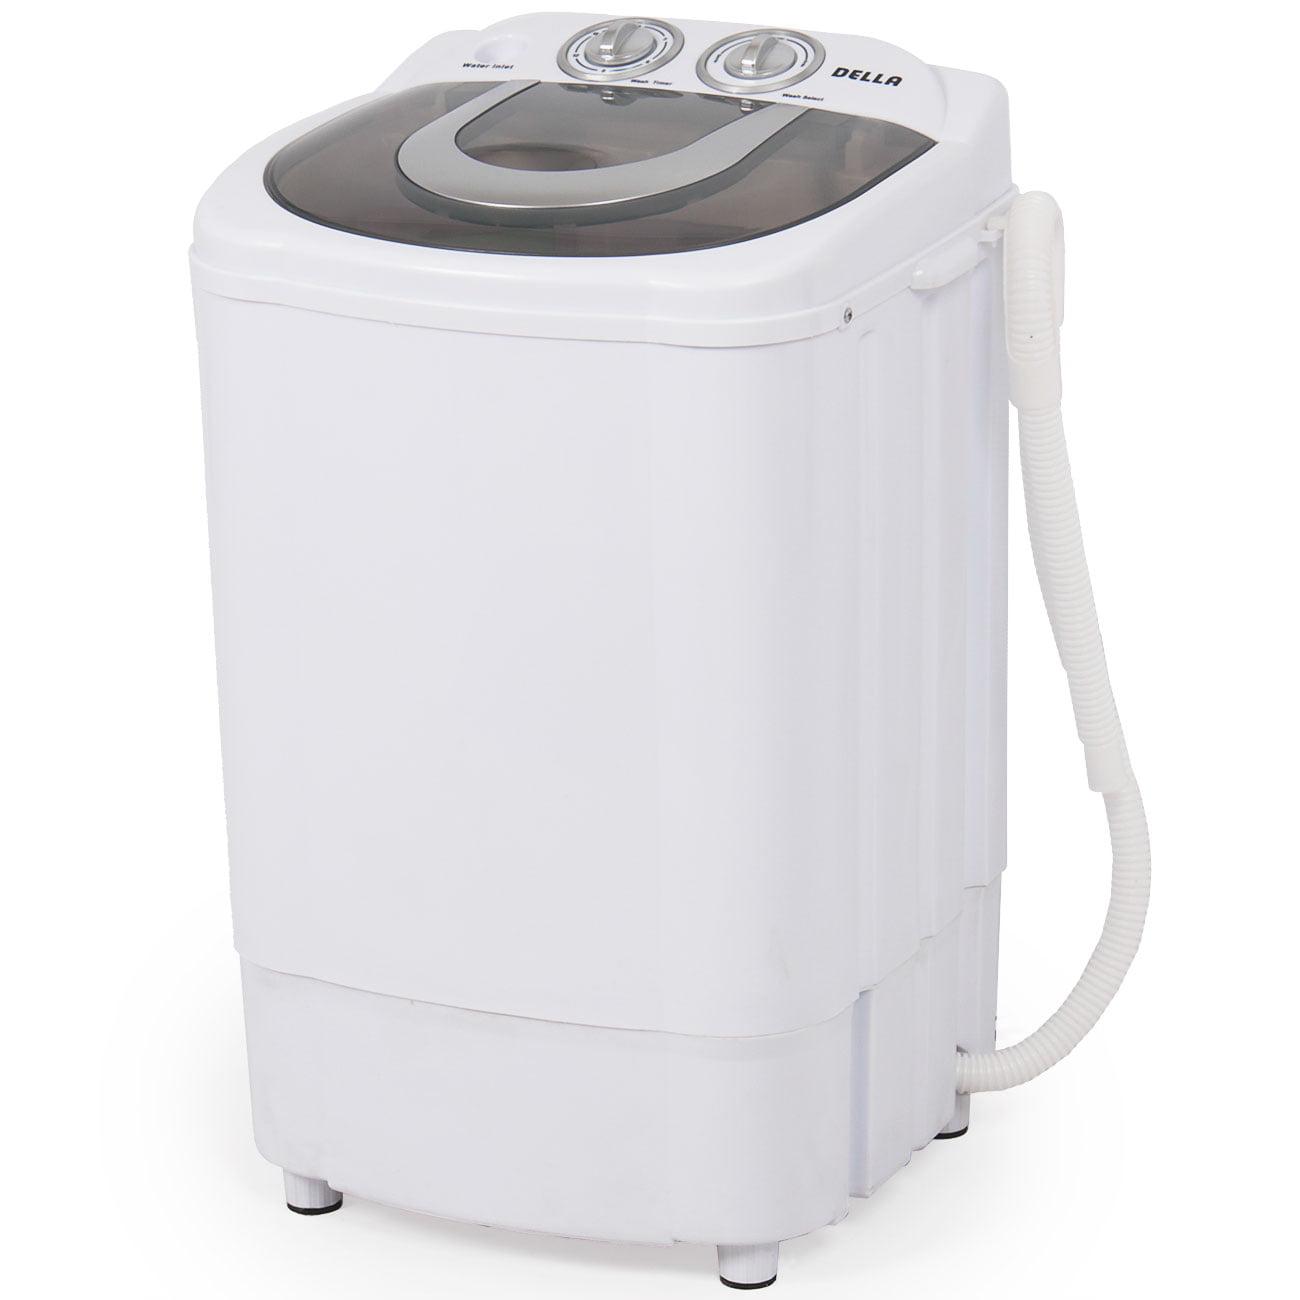 Della Mini Portable Washing Machine & Spin Wash 8.8 Lbs Capacity Compact Laundry Washer